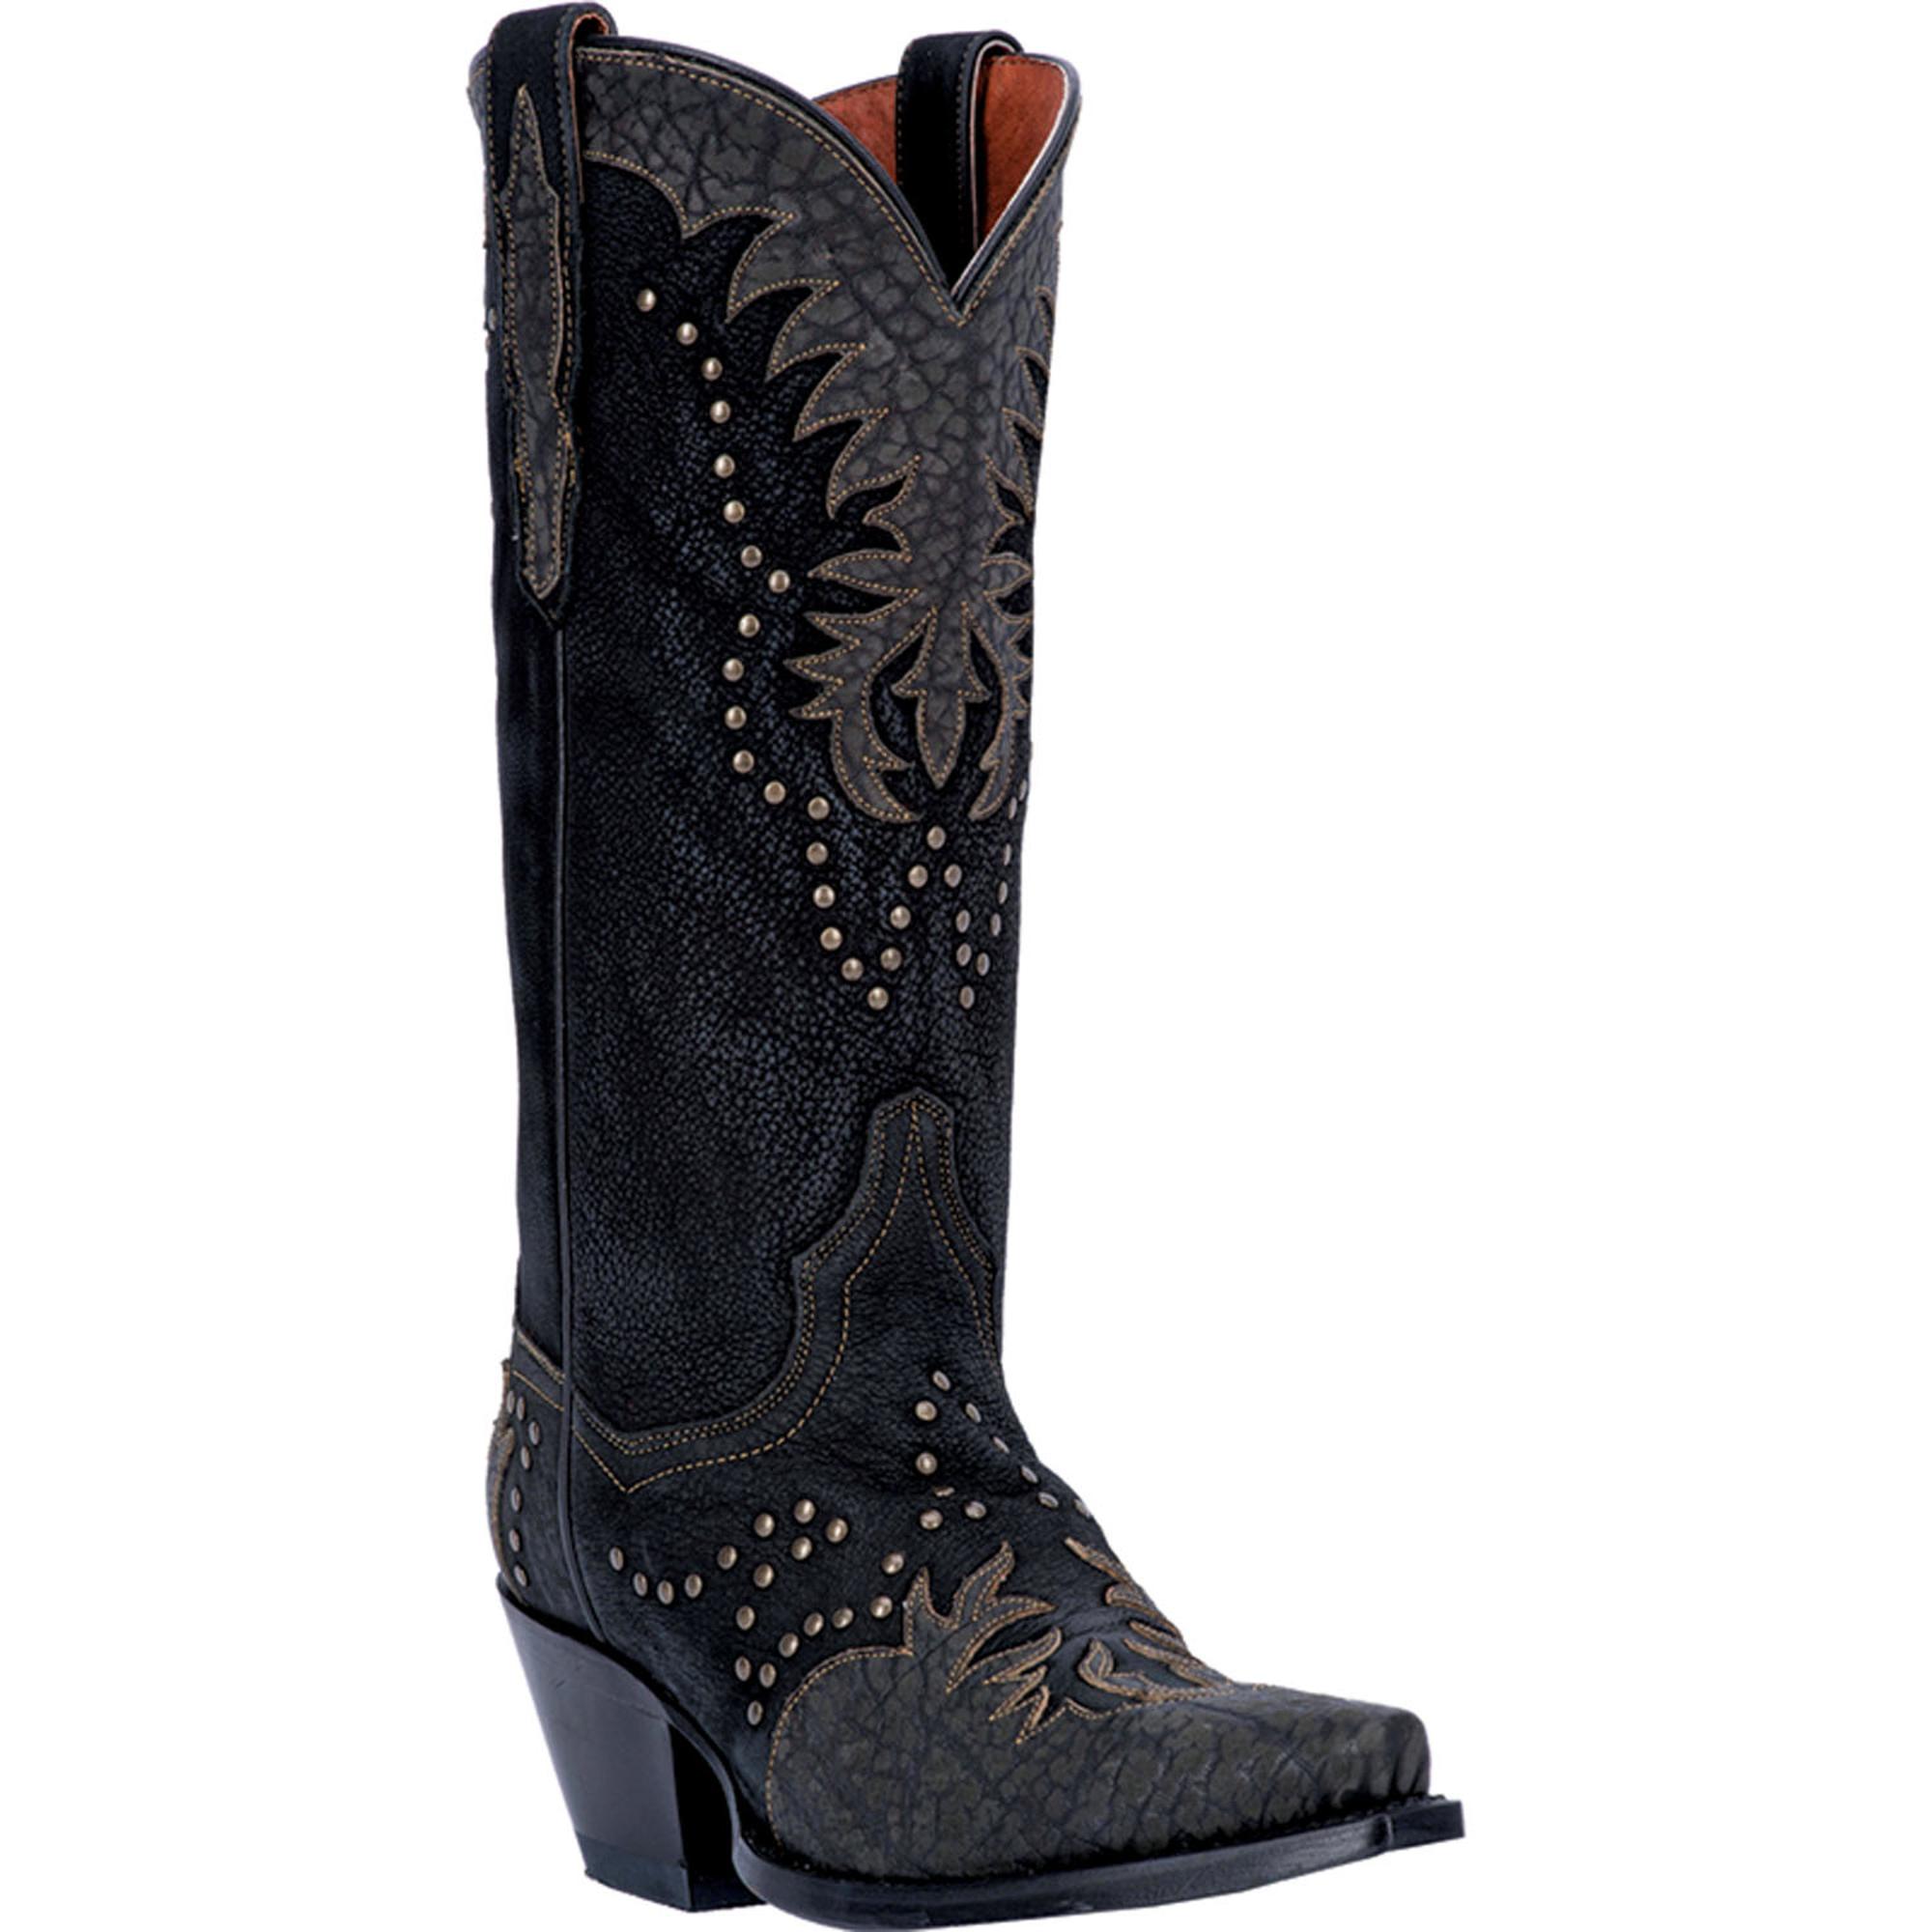 Excellent In The Dan Post Maria Boots In Black Mignon Leather The Dan Post